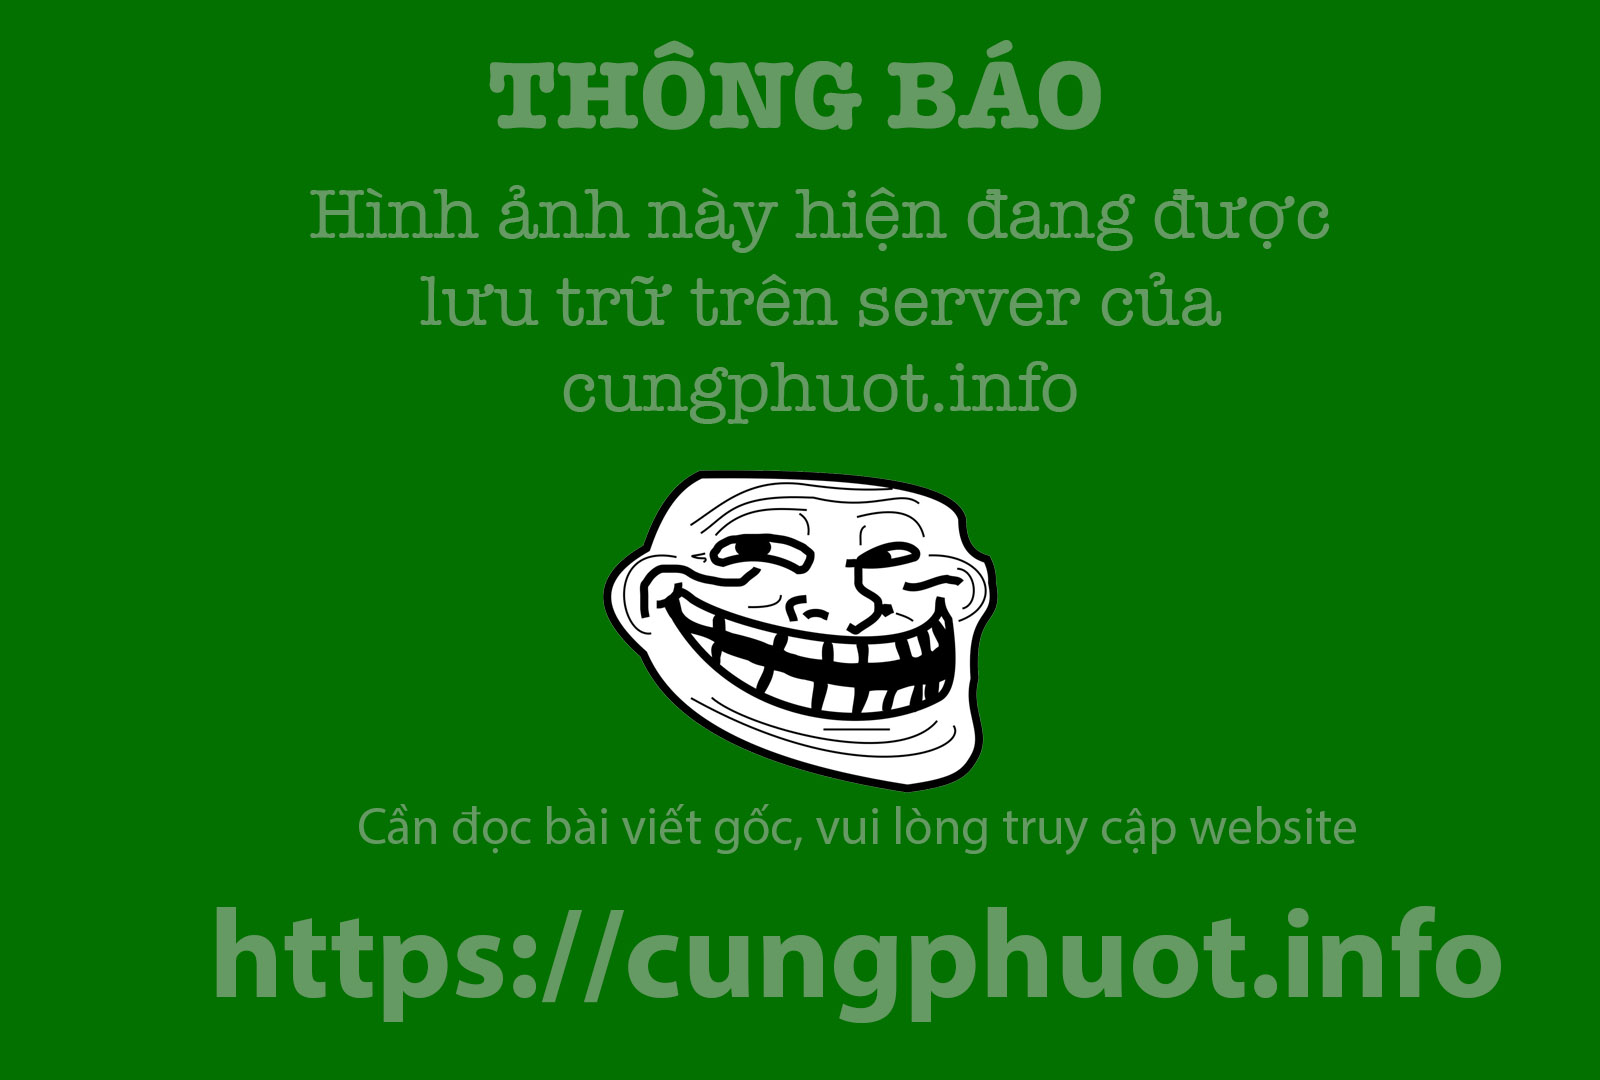 Ảnh: @nthgiang_bo